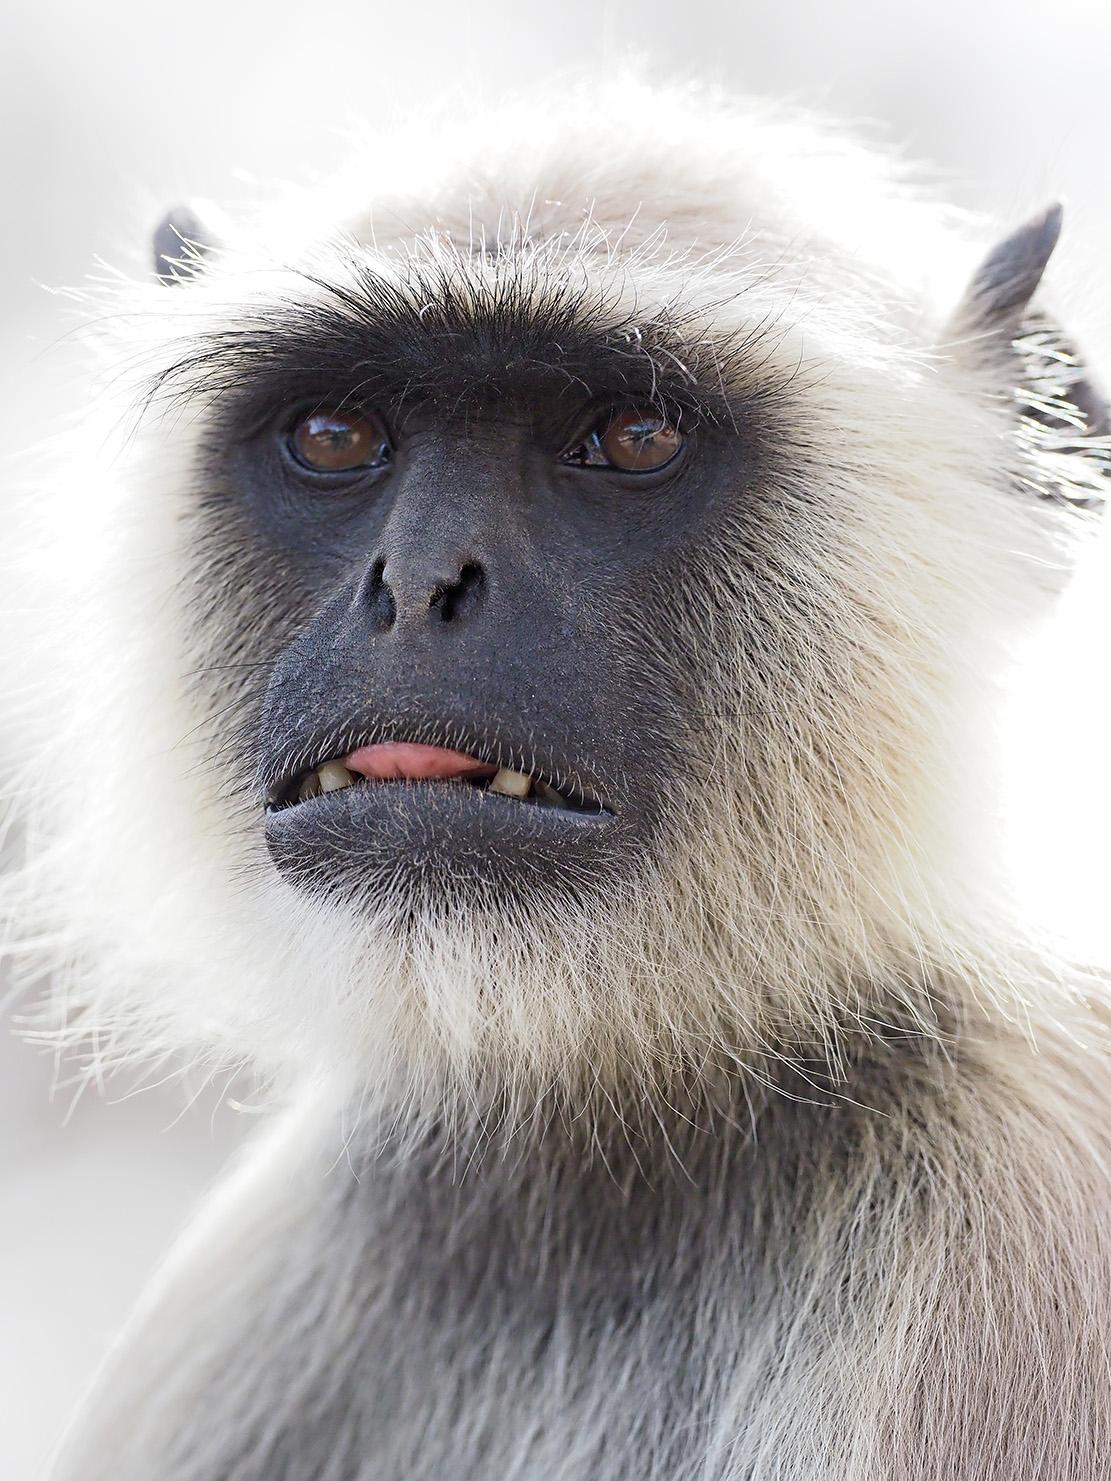 Wildlife portraits by Ranjan